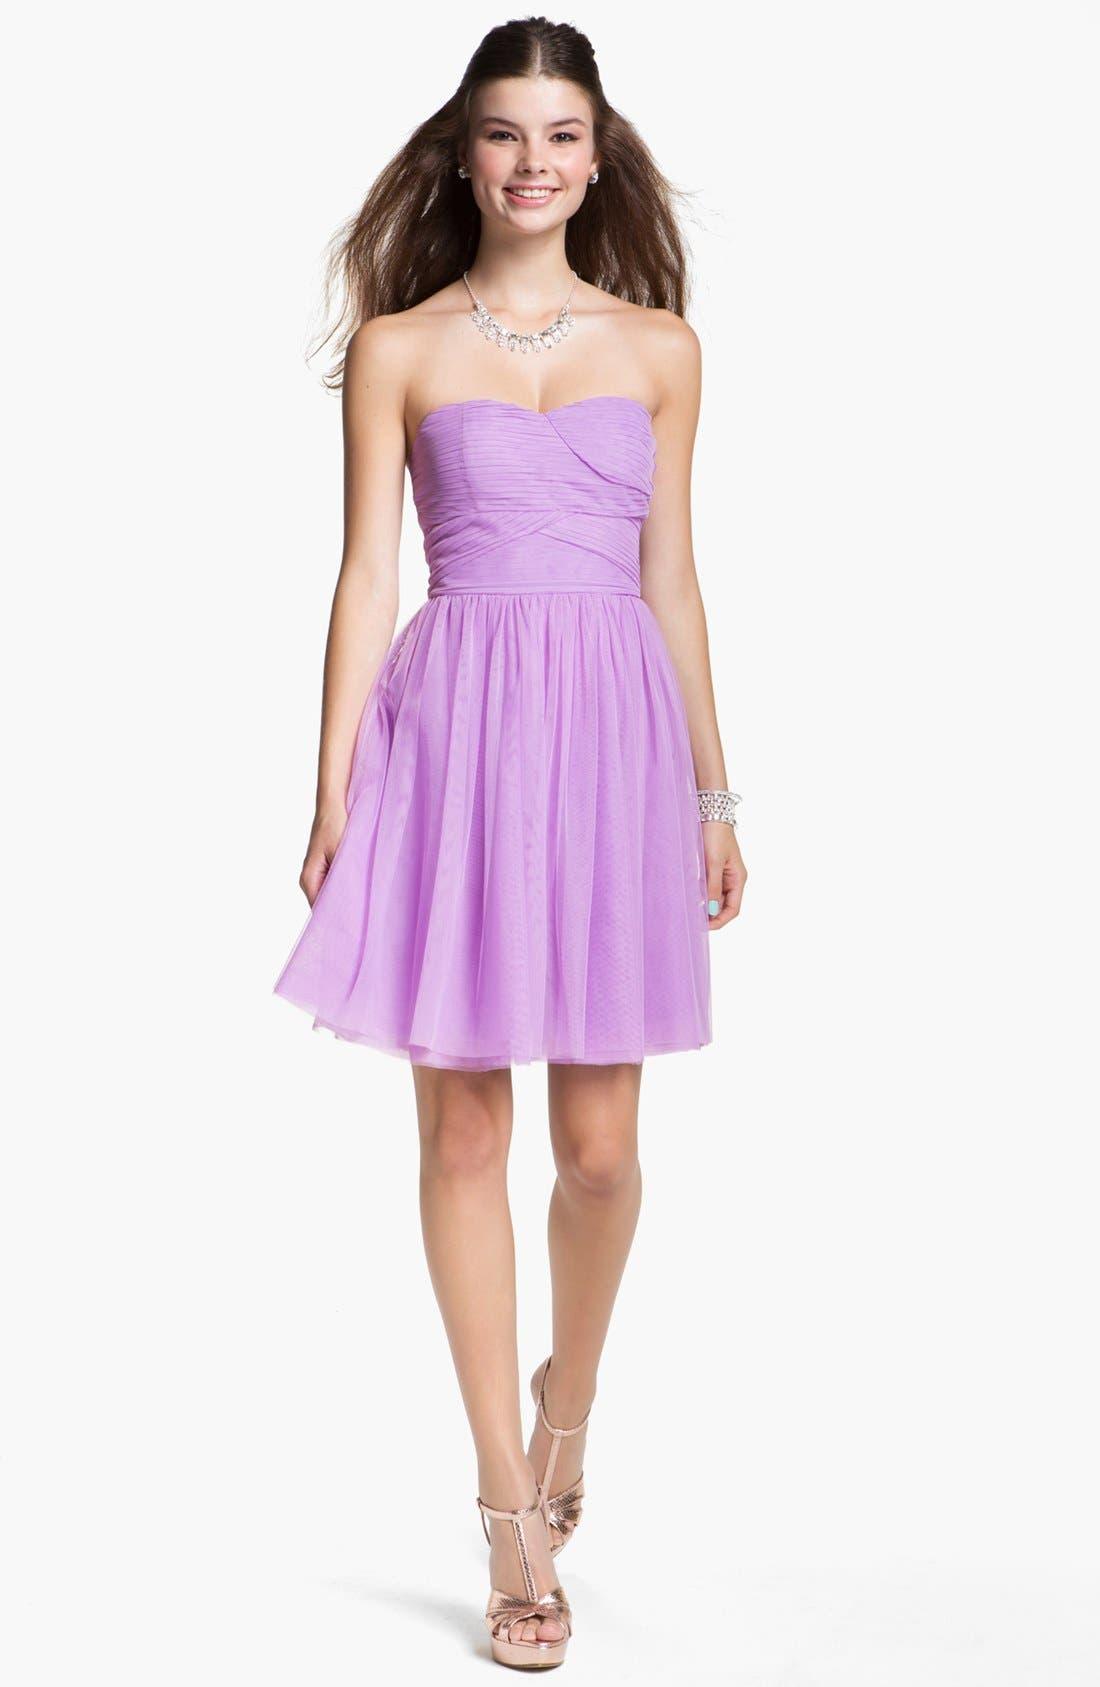 Alternate Image 1 Selected - En Crème Chiffon Skater Dress (Juniors)